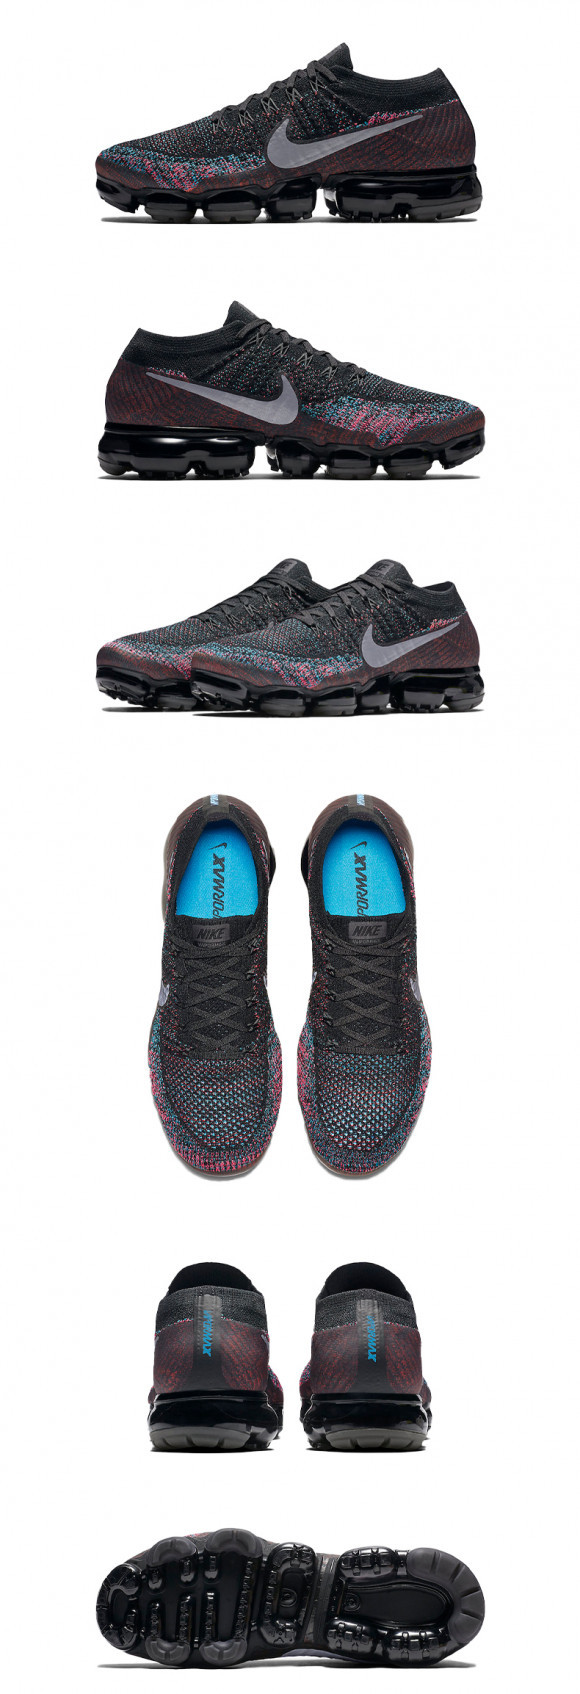 Nike Air VAPORMAX Flyknit Black/METALLIC SILVER-BLUE LAGOON Marathon Running Shoes/Sneakers 849558-015 - 849558-015